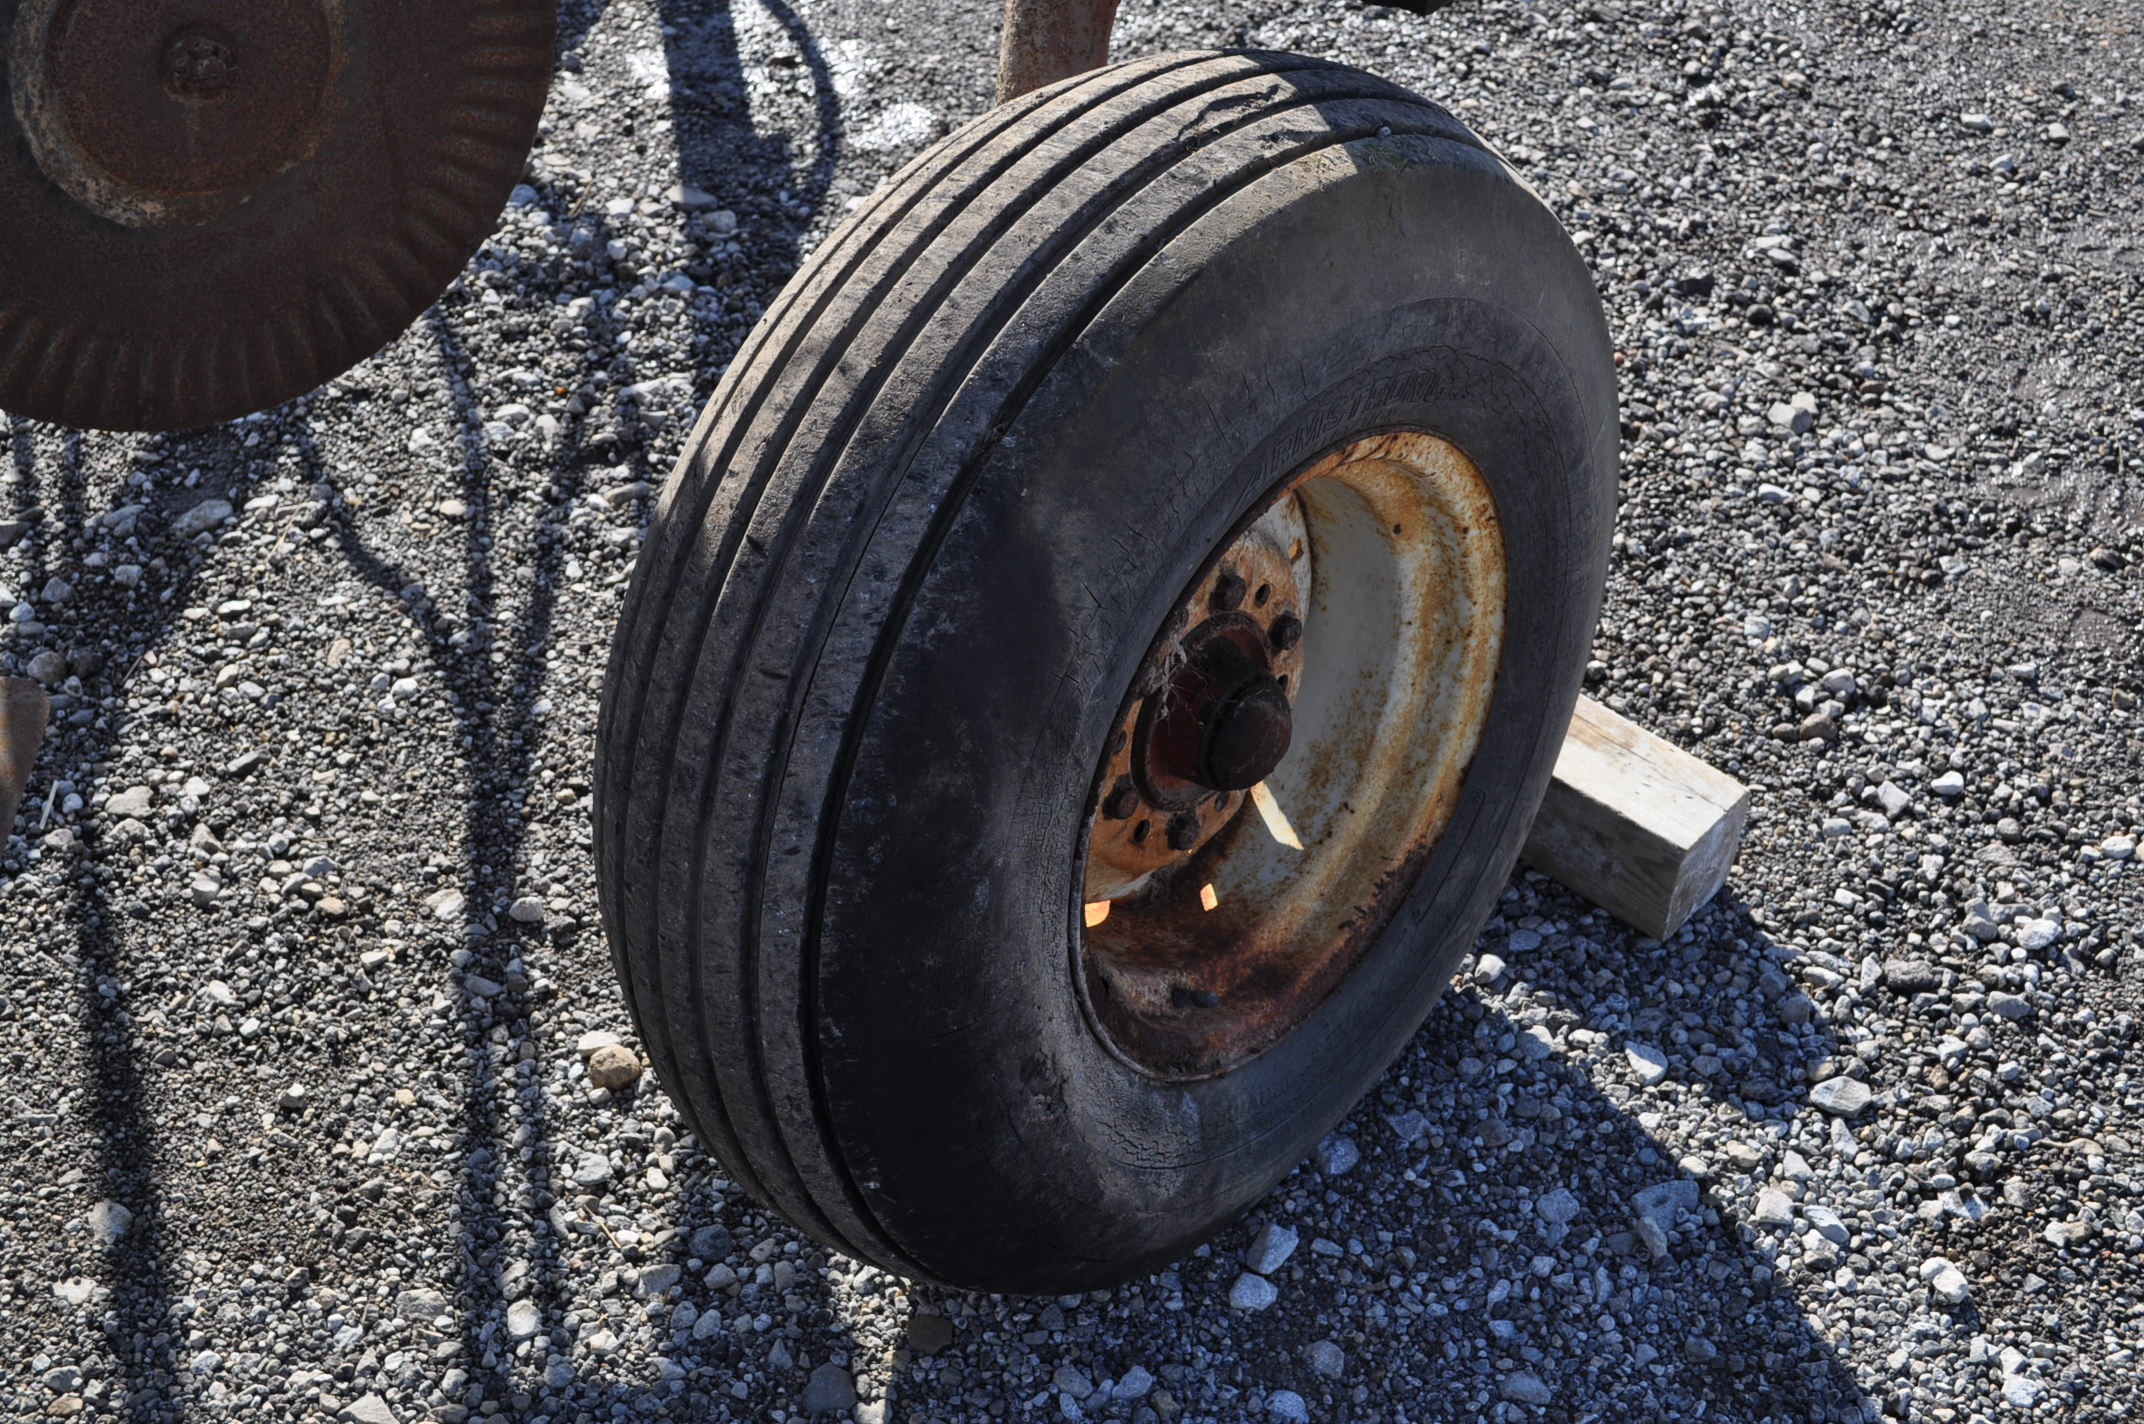 International 700 onland moldboard plow, 7 btm, auto reset trip - Image 8 of 16